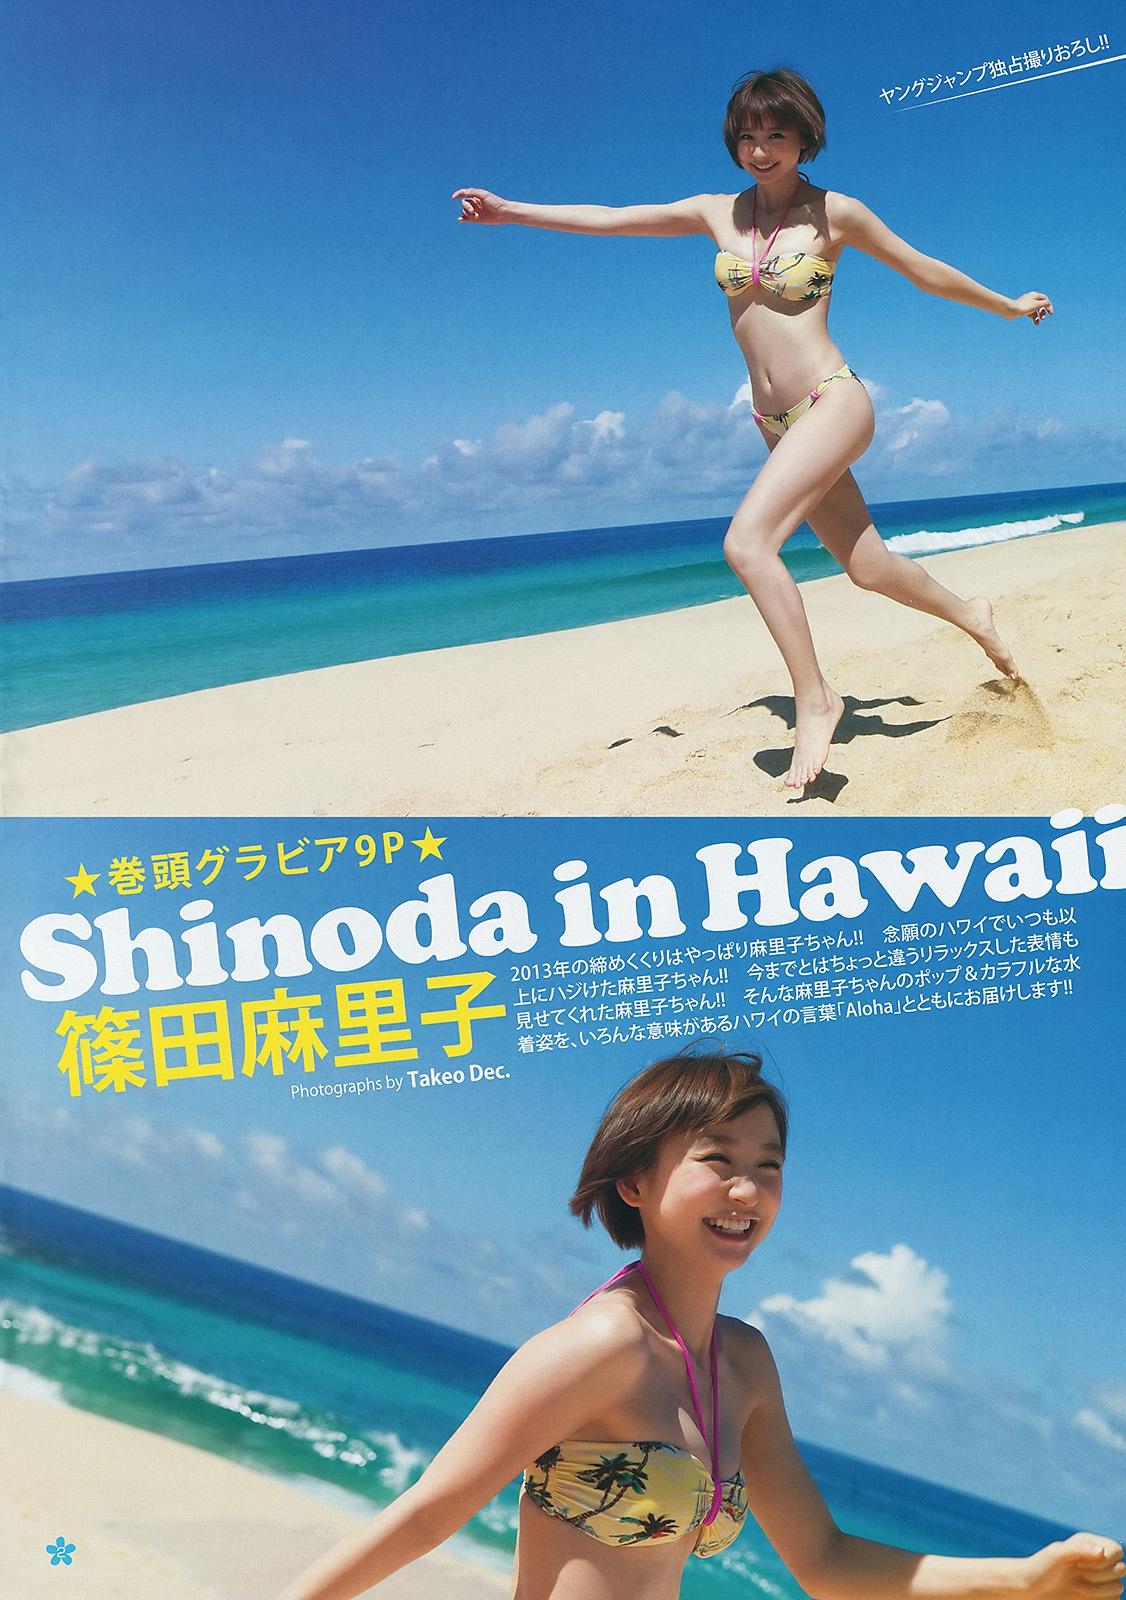 Mariko Shinoda Android Iphone Wallpaper 38482 Asiachan